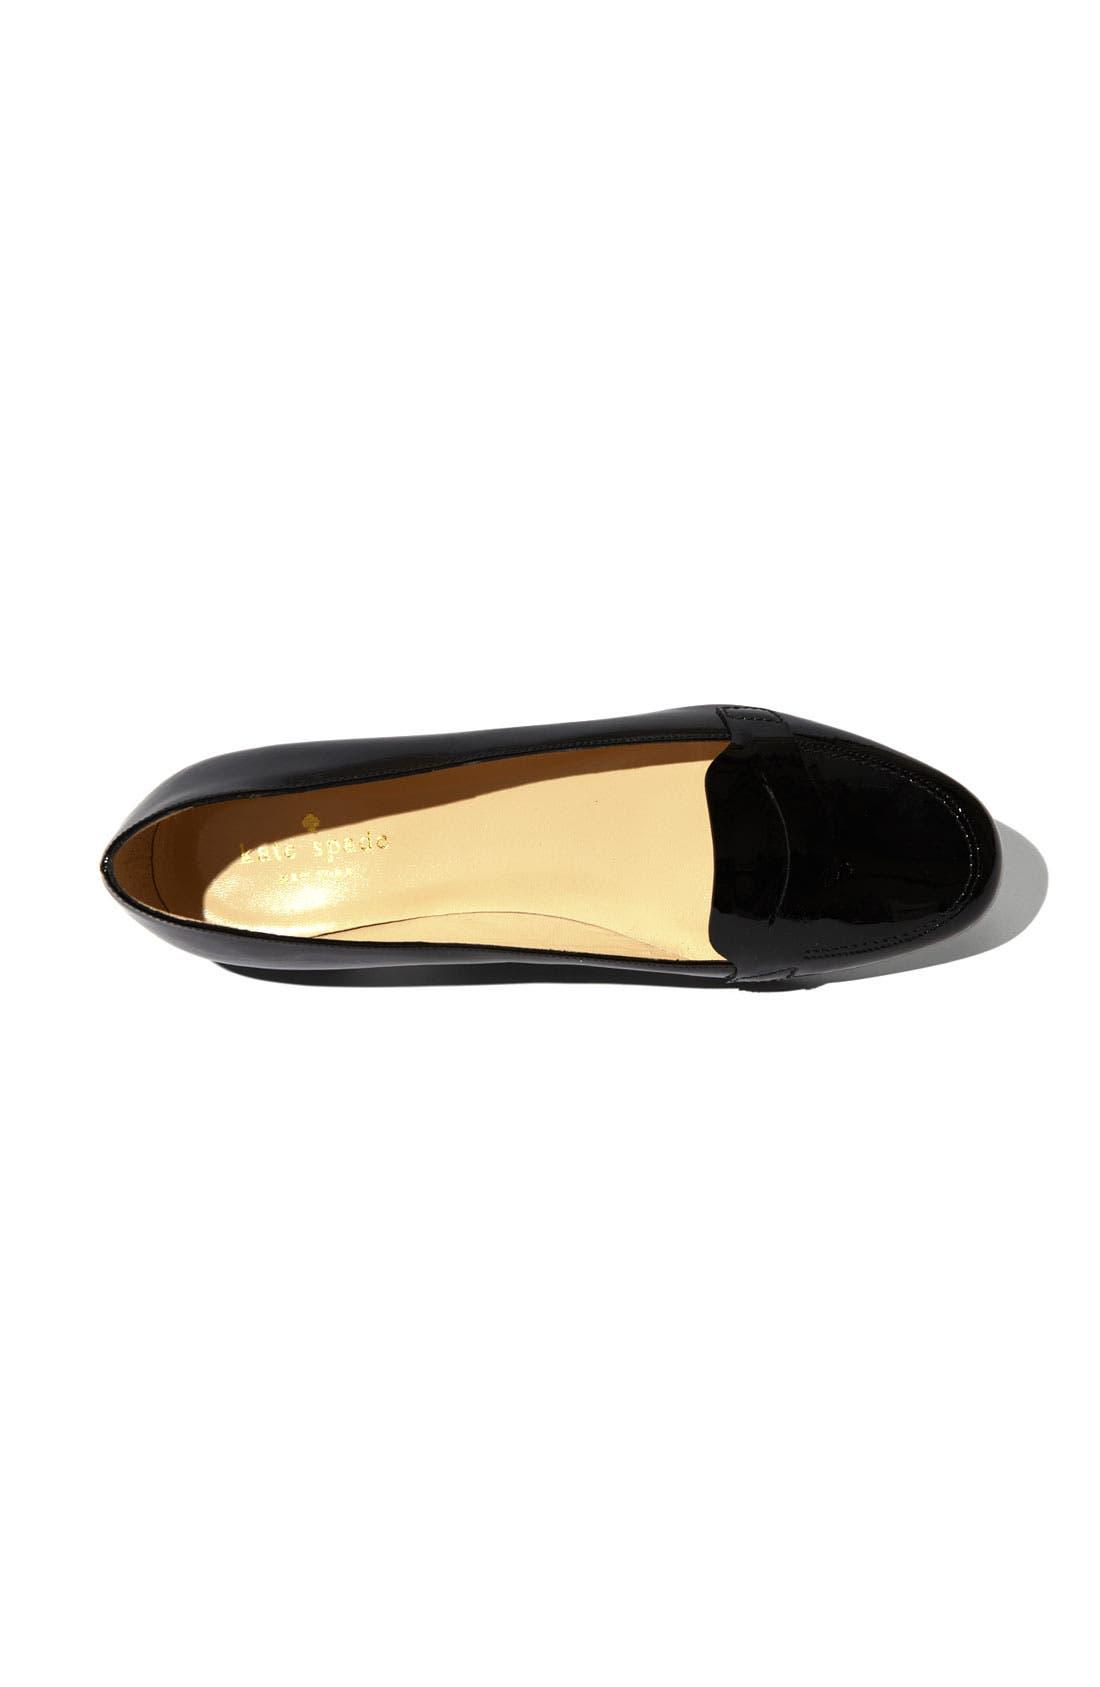 Alternate Image 3  - kate spade new york 'olympia' loafer